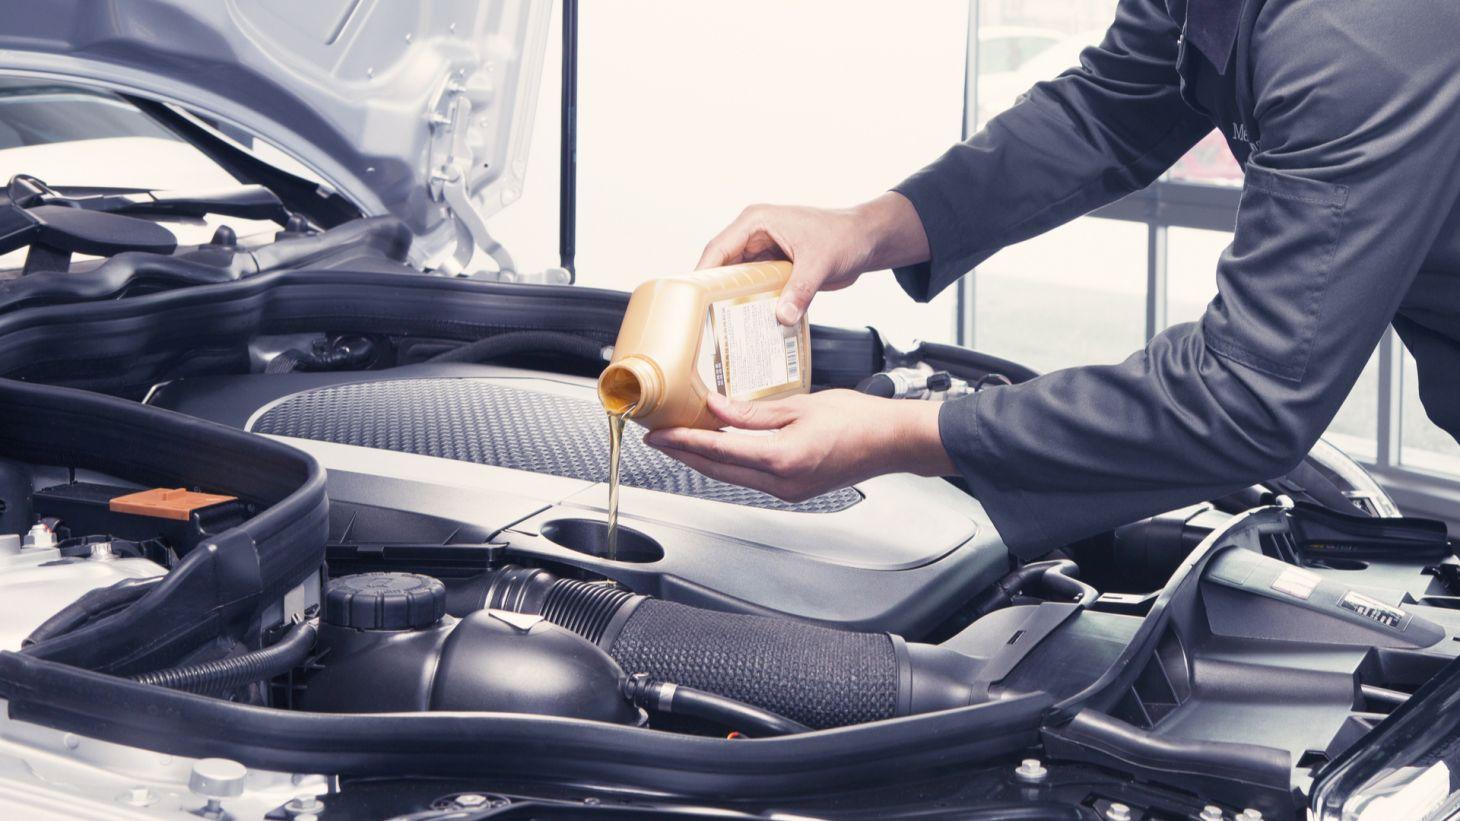 dono carro colocando oleo motor automovel